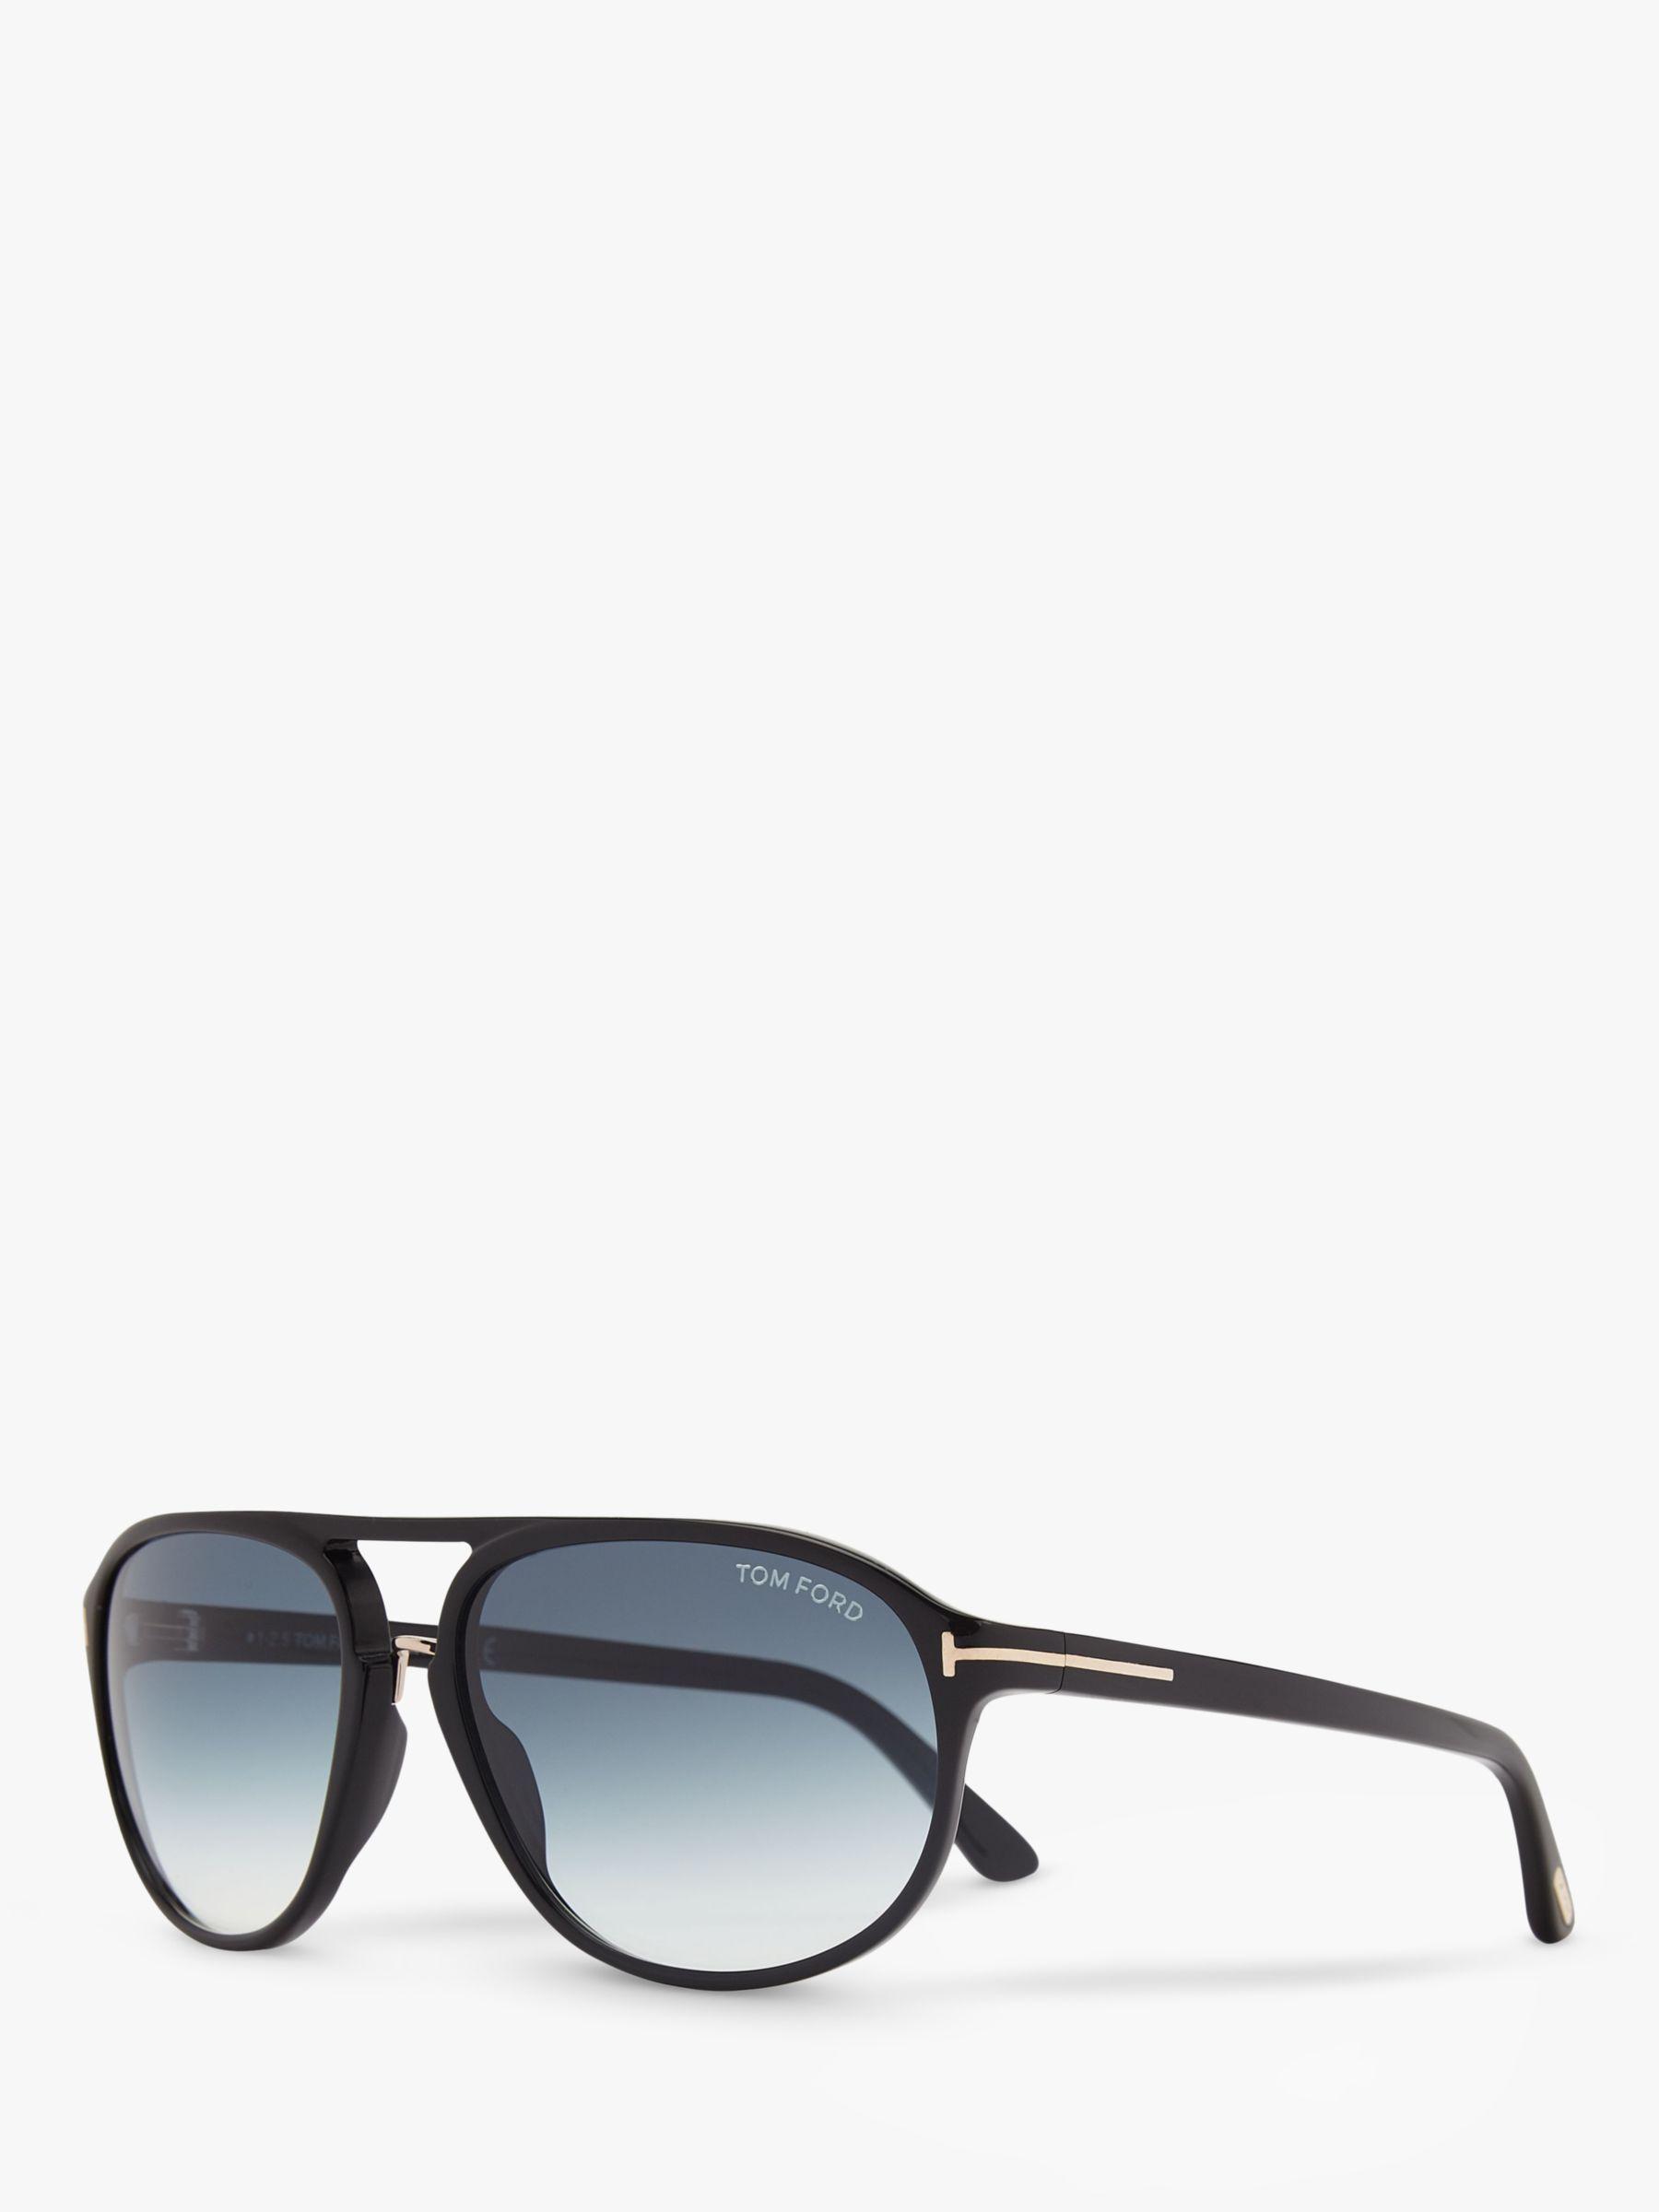 Tom Ford TOM FORD FT0447 Jacob Gradient Aviator Sunglasses, Black/Blue